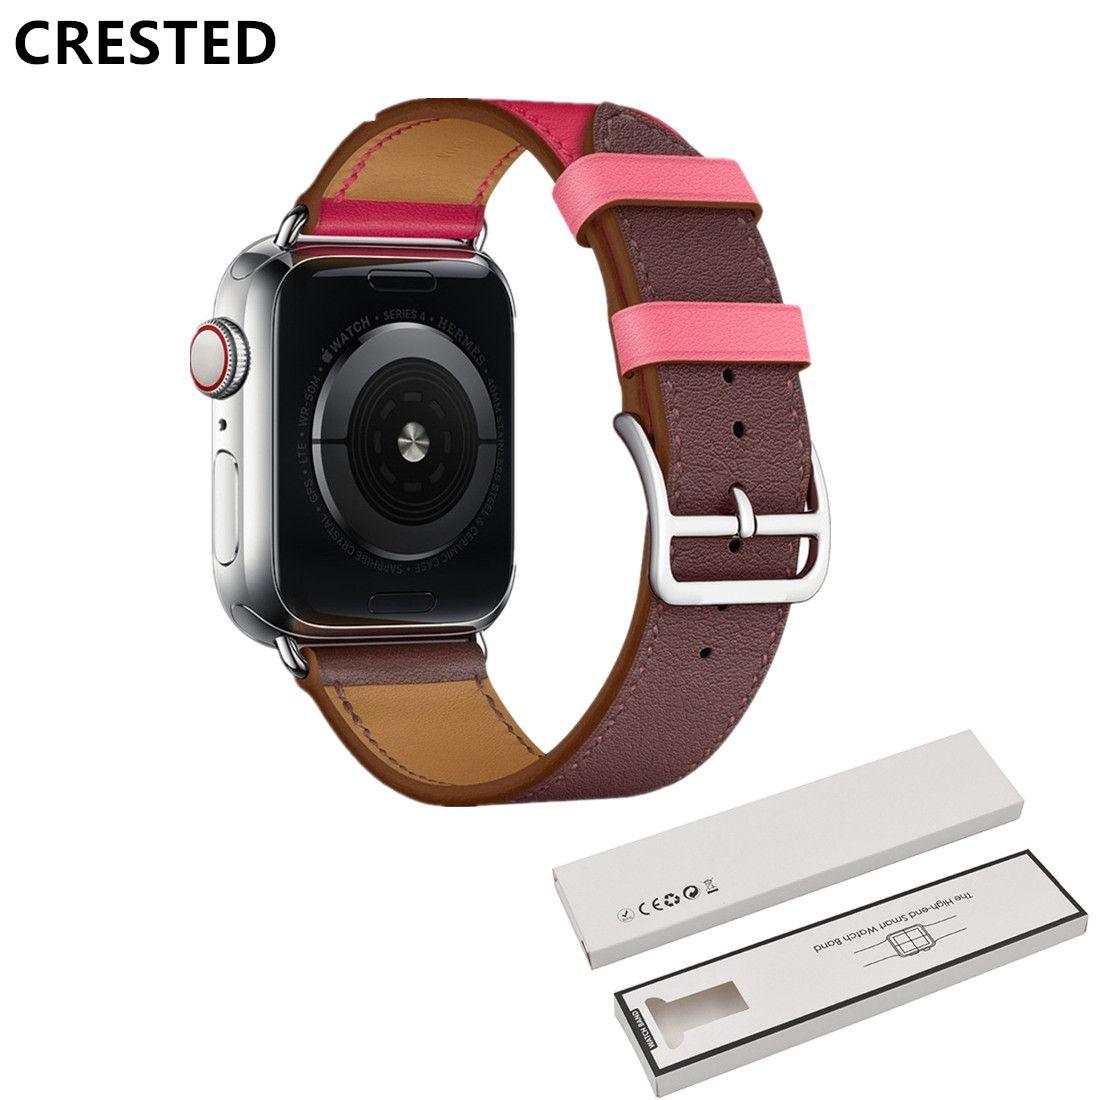 CRESTED single tour Leather strap For Apple Watch band 4 44mm 40mm bracelet iwatch series 3/2/1 42mm 38mm Wrist bracelet belt